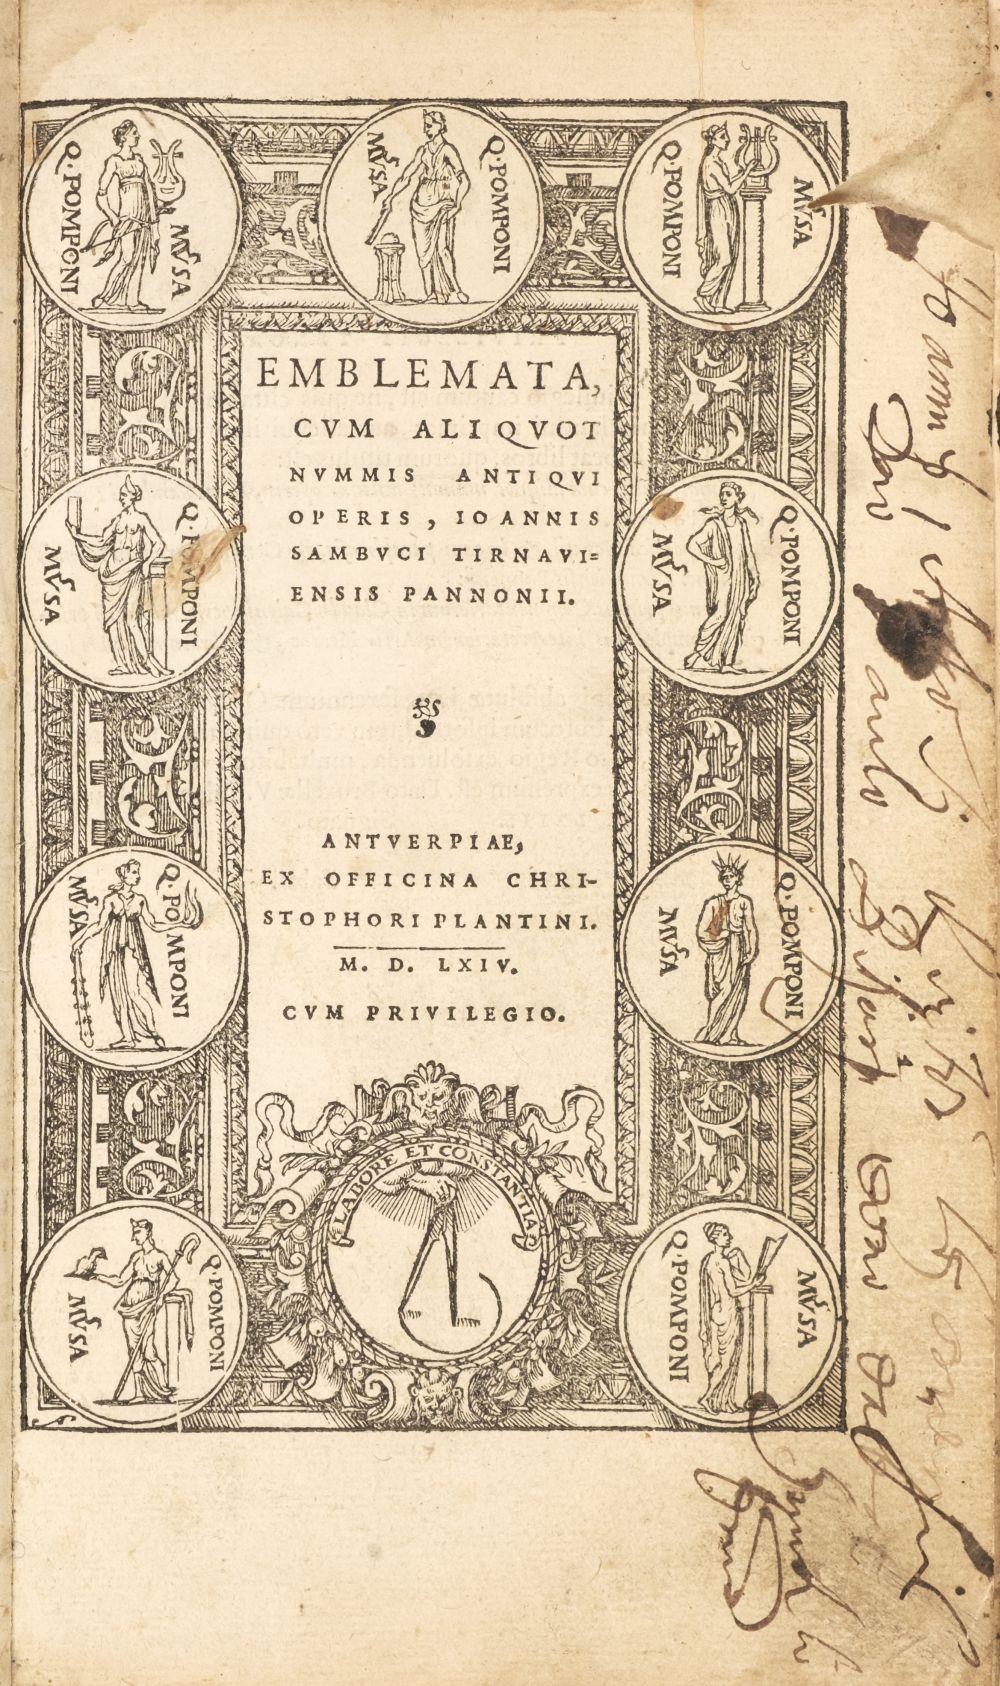 Sambucus (Joannes). Emblemata, Antwerp: Christopher Plantin, 1564